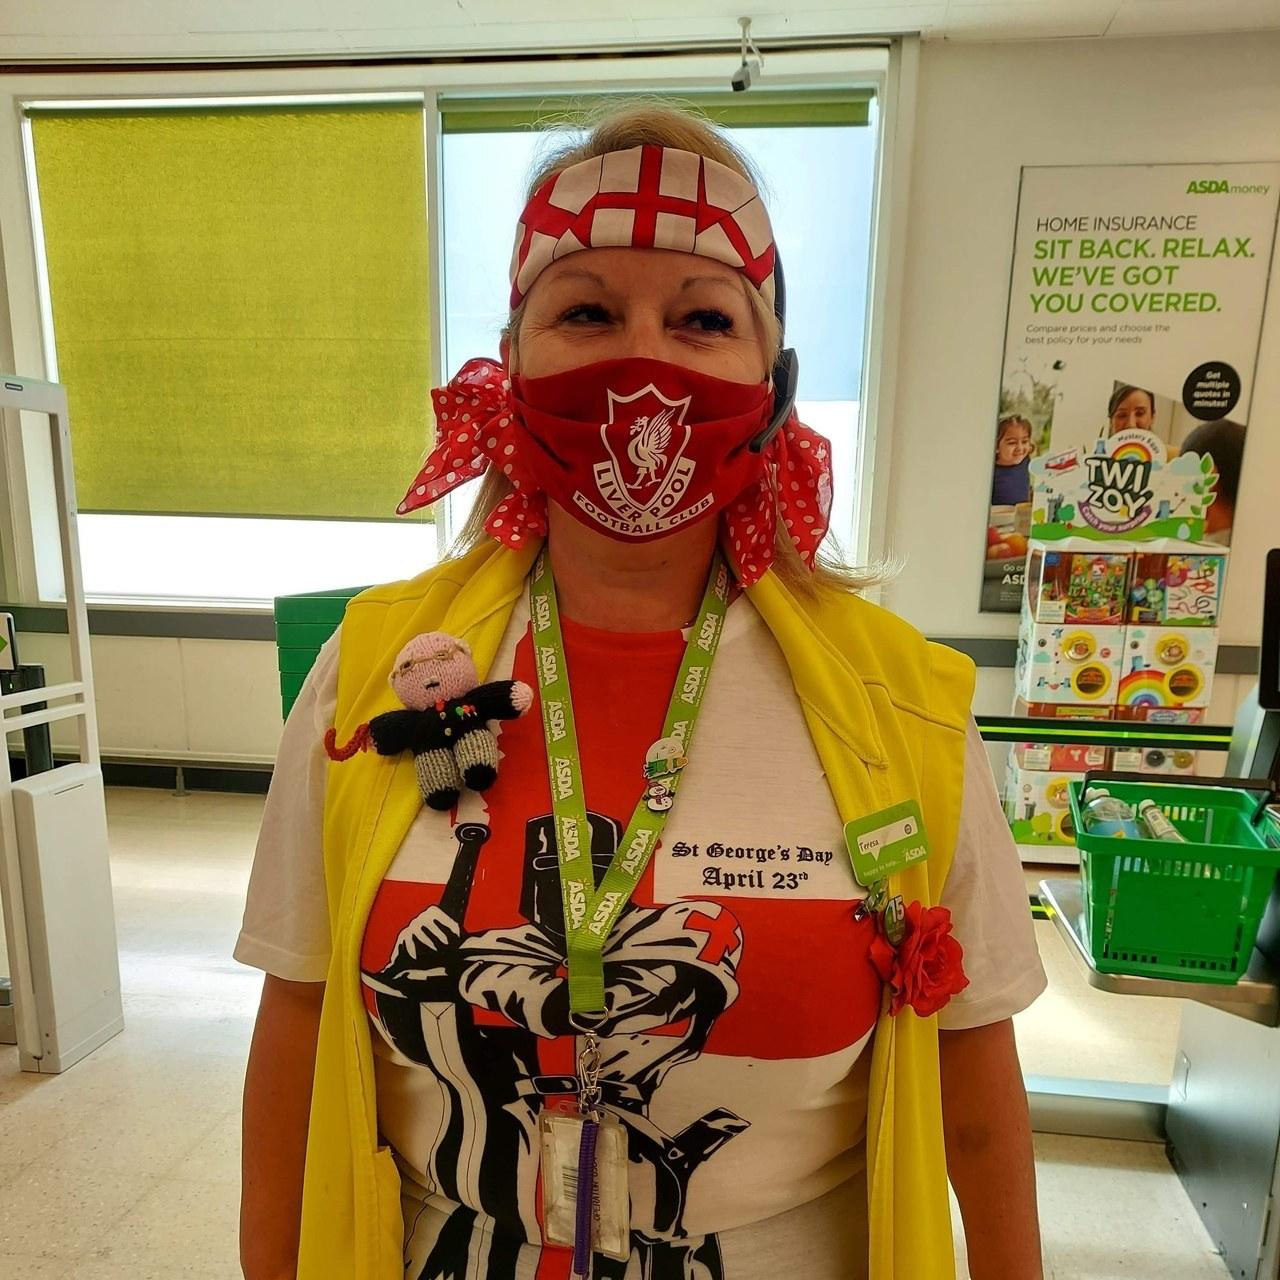 St George's Day celebrations | Asda Sutton in Ashfield